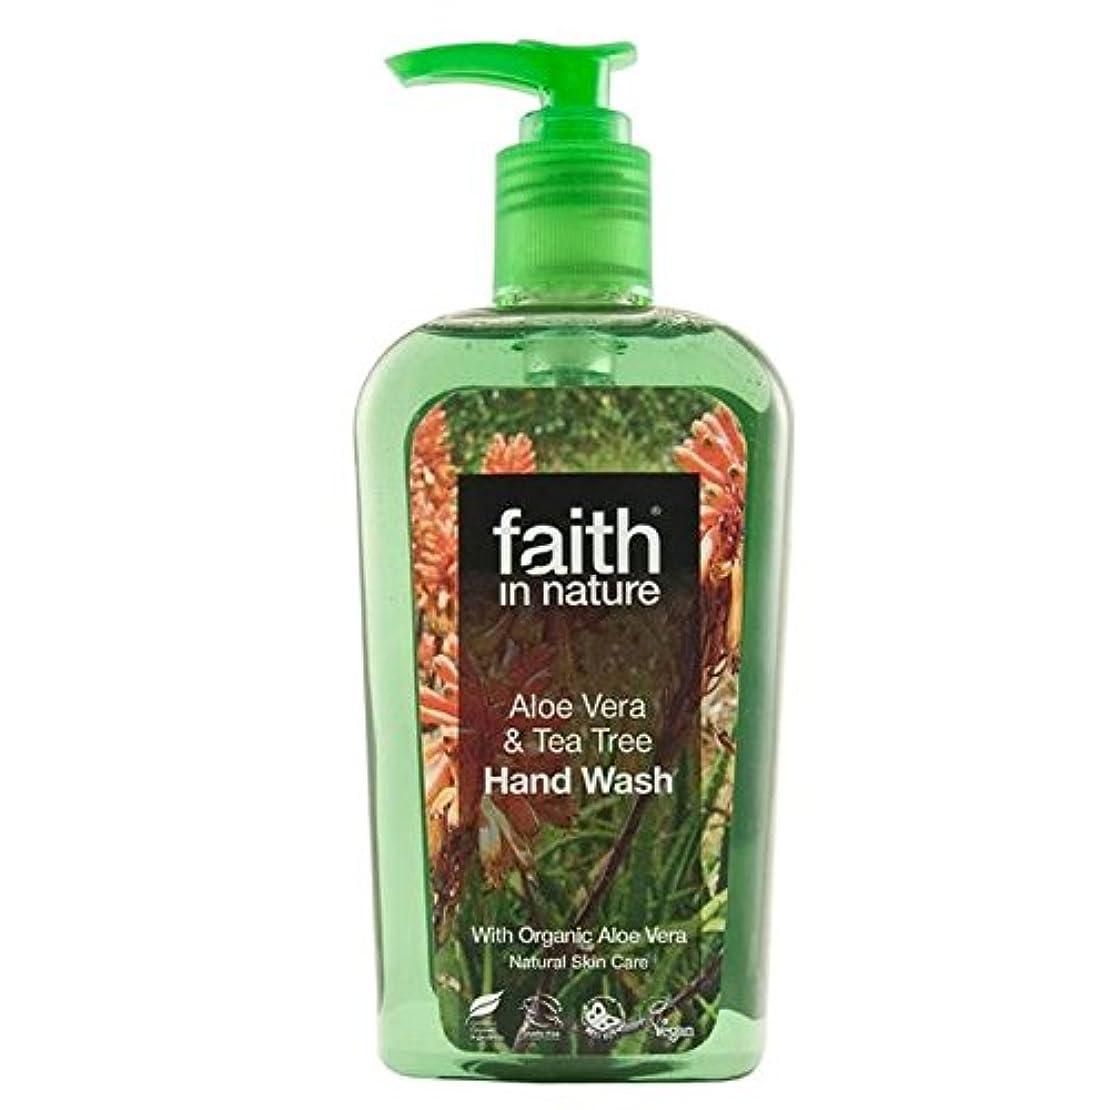 Faith in Nature Aloe Vera & Tea Tree Handwash 300ml (Pack of 4) - (Faith In Nature) 自然のアロエベラ&ティーツリー手洗いの300ミリリットル...